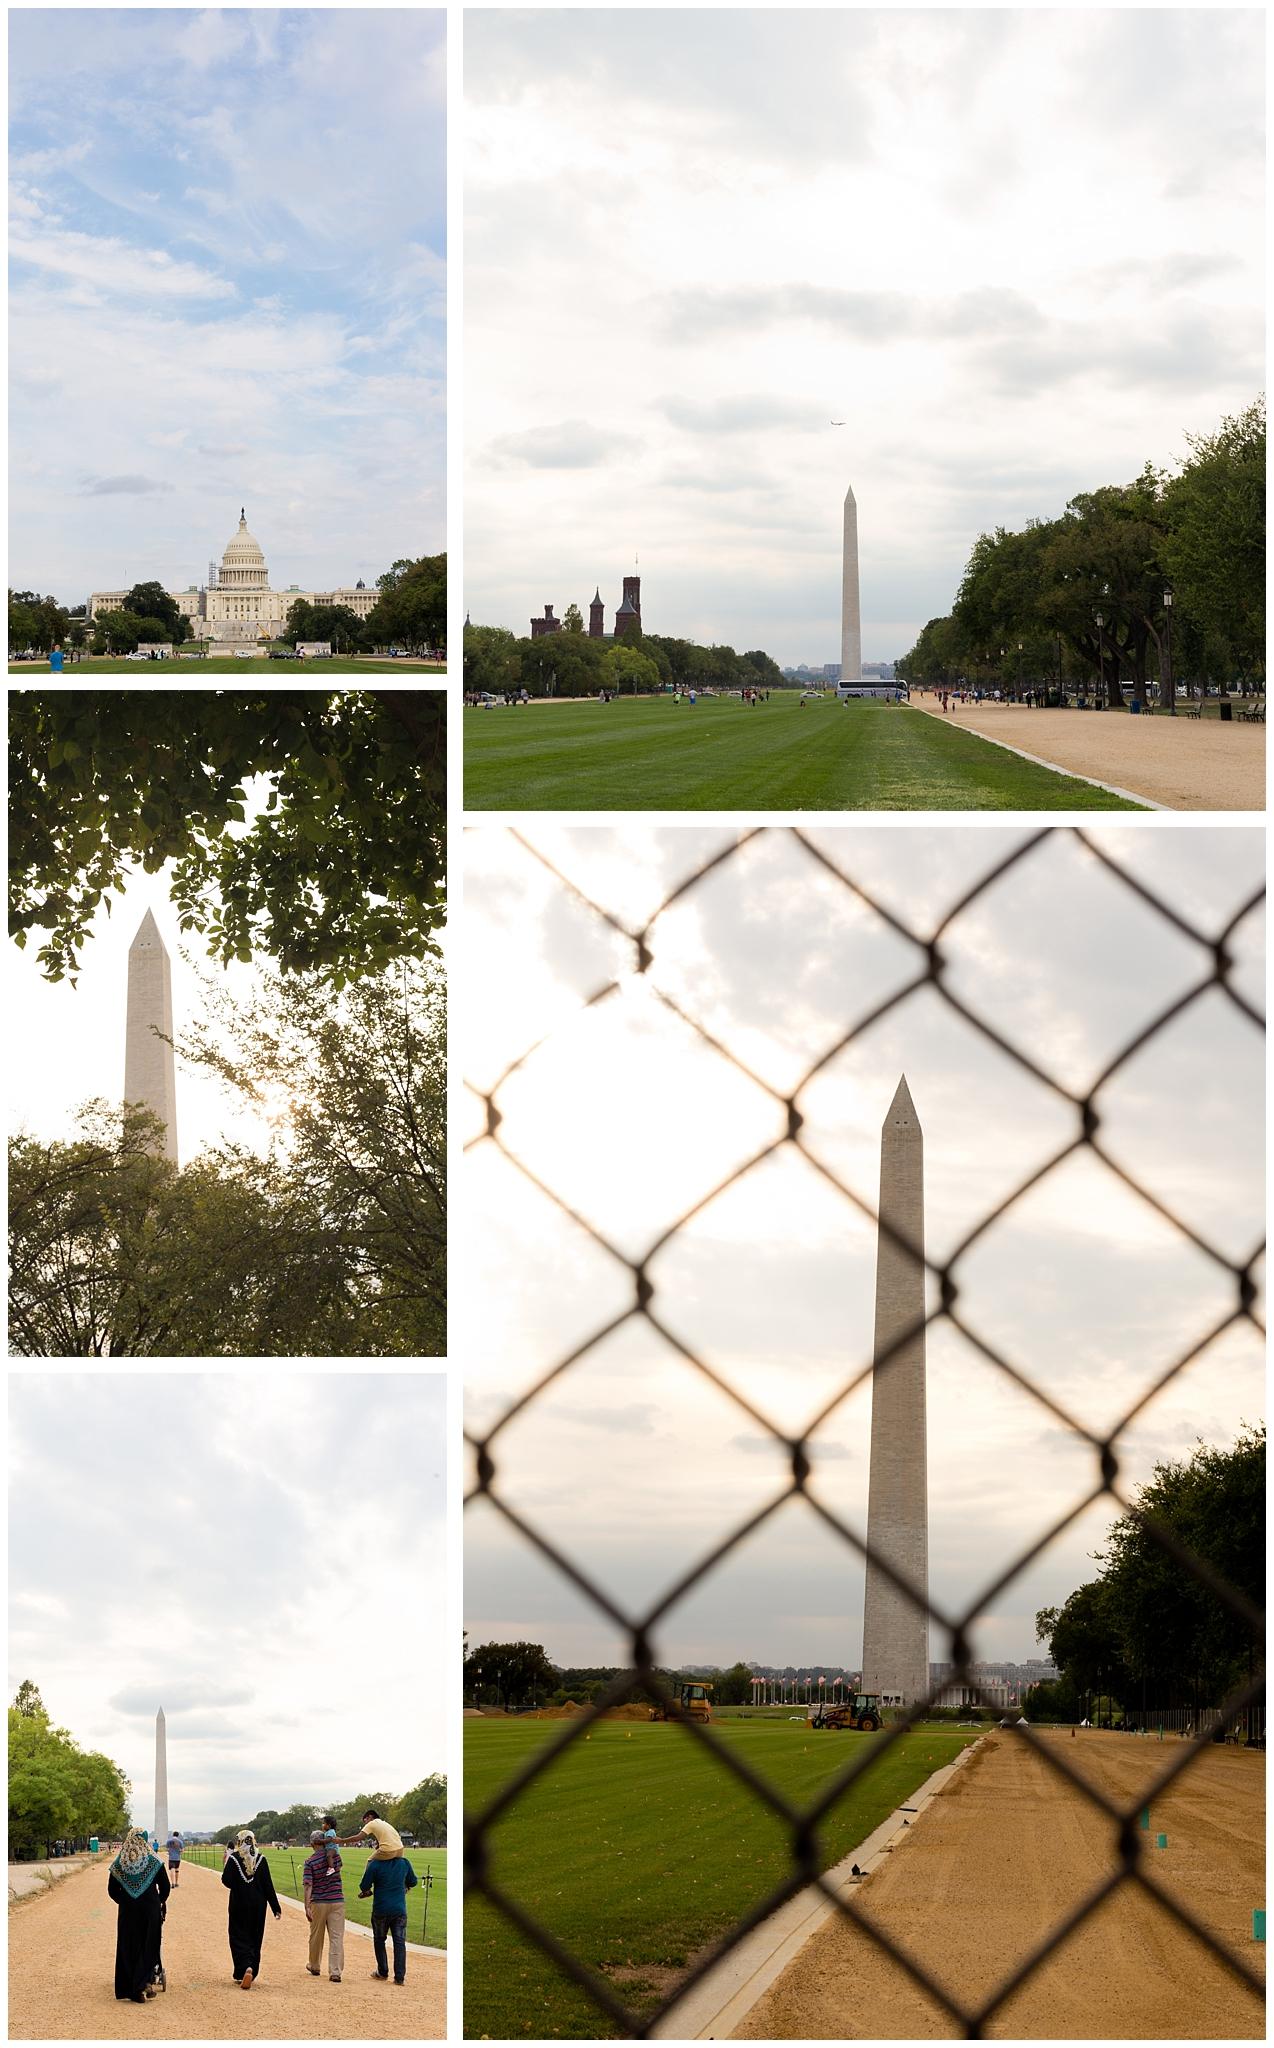 National Mall (Capitol and Washington Monument) in Washington, DC